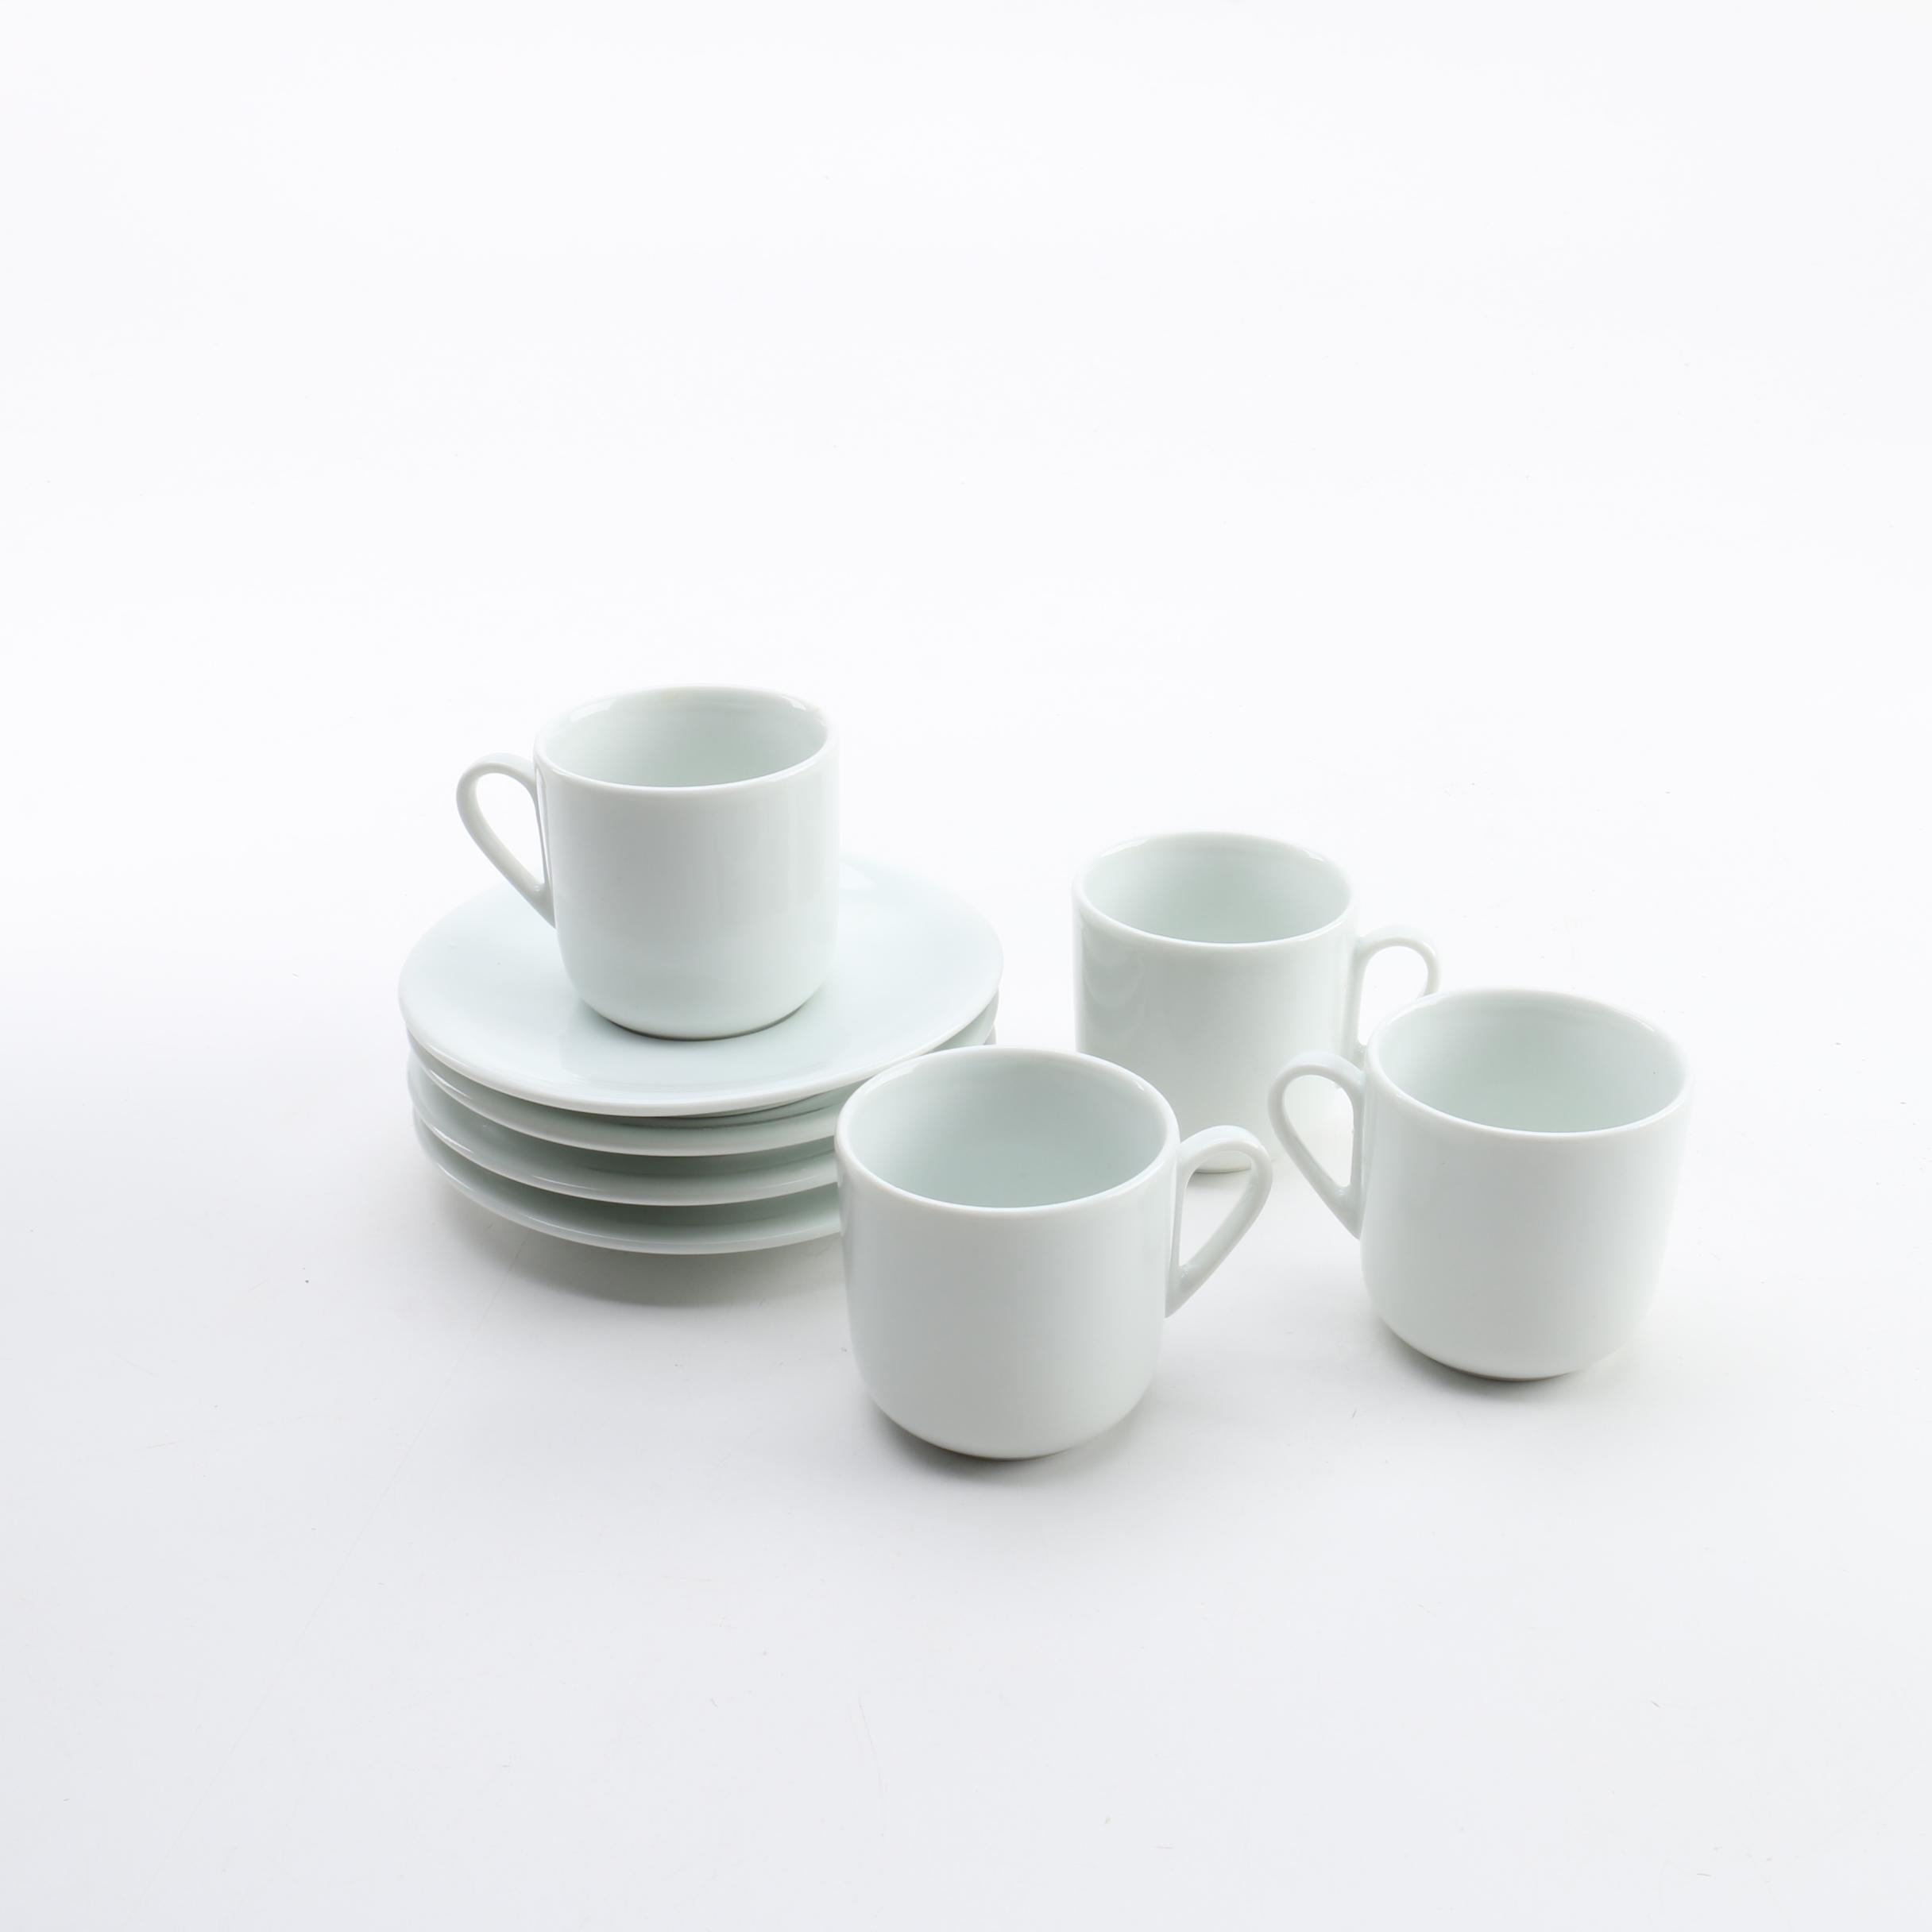 Vintage Italian Ceramic Espresso Cups and Saucers